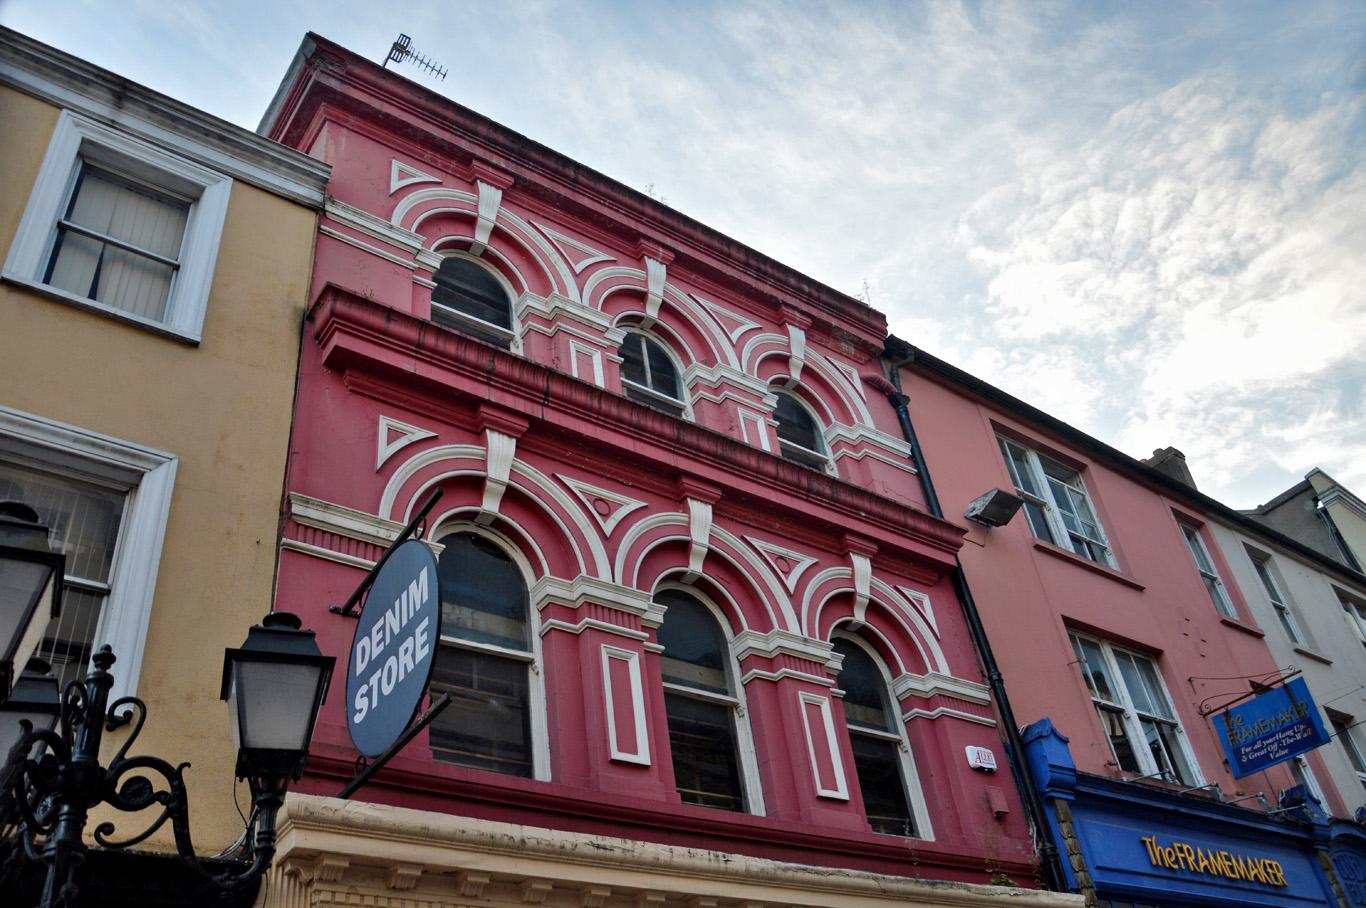 Colorful buildings in Cork